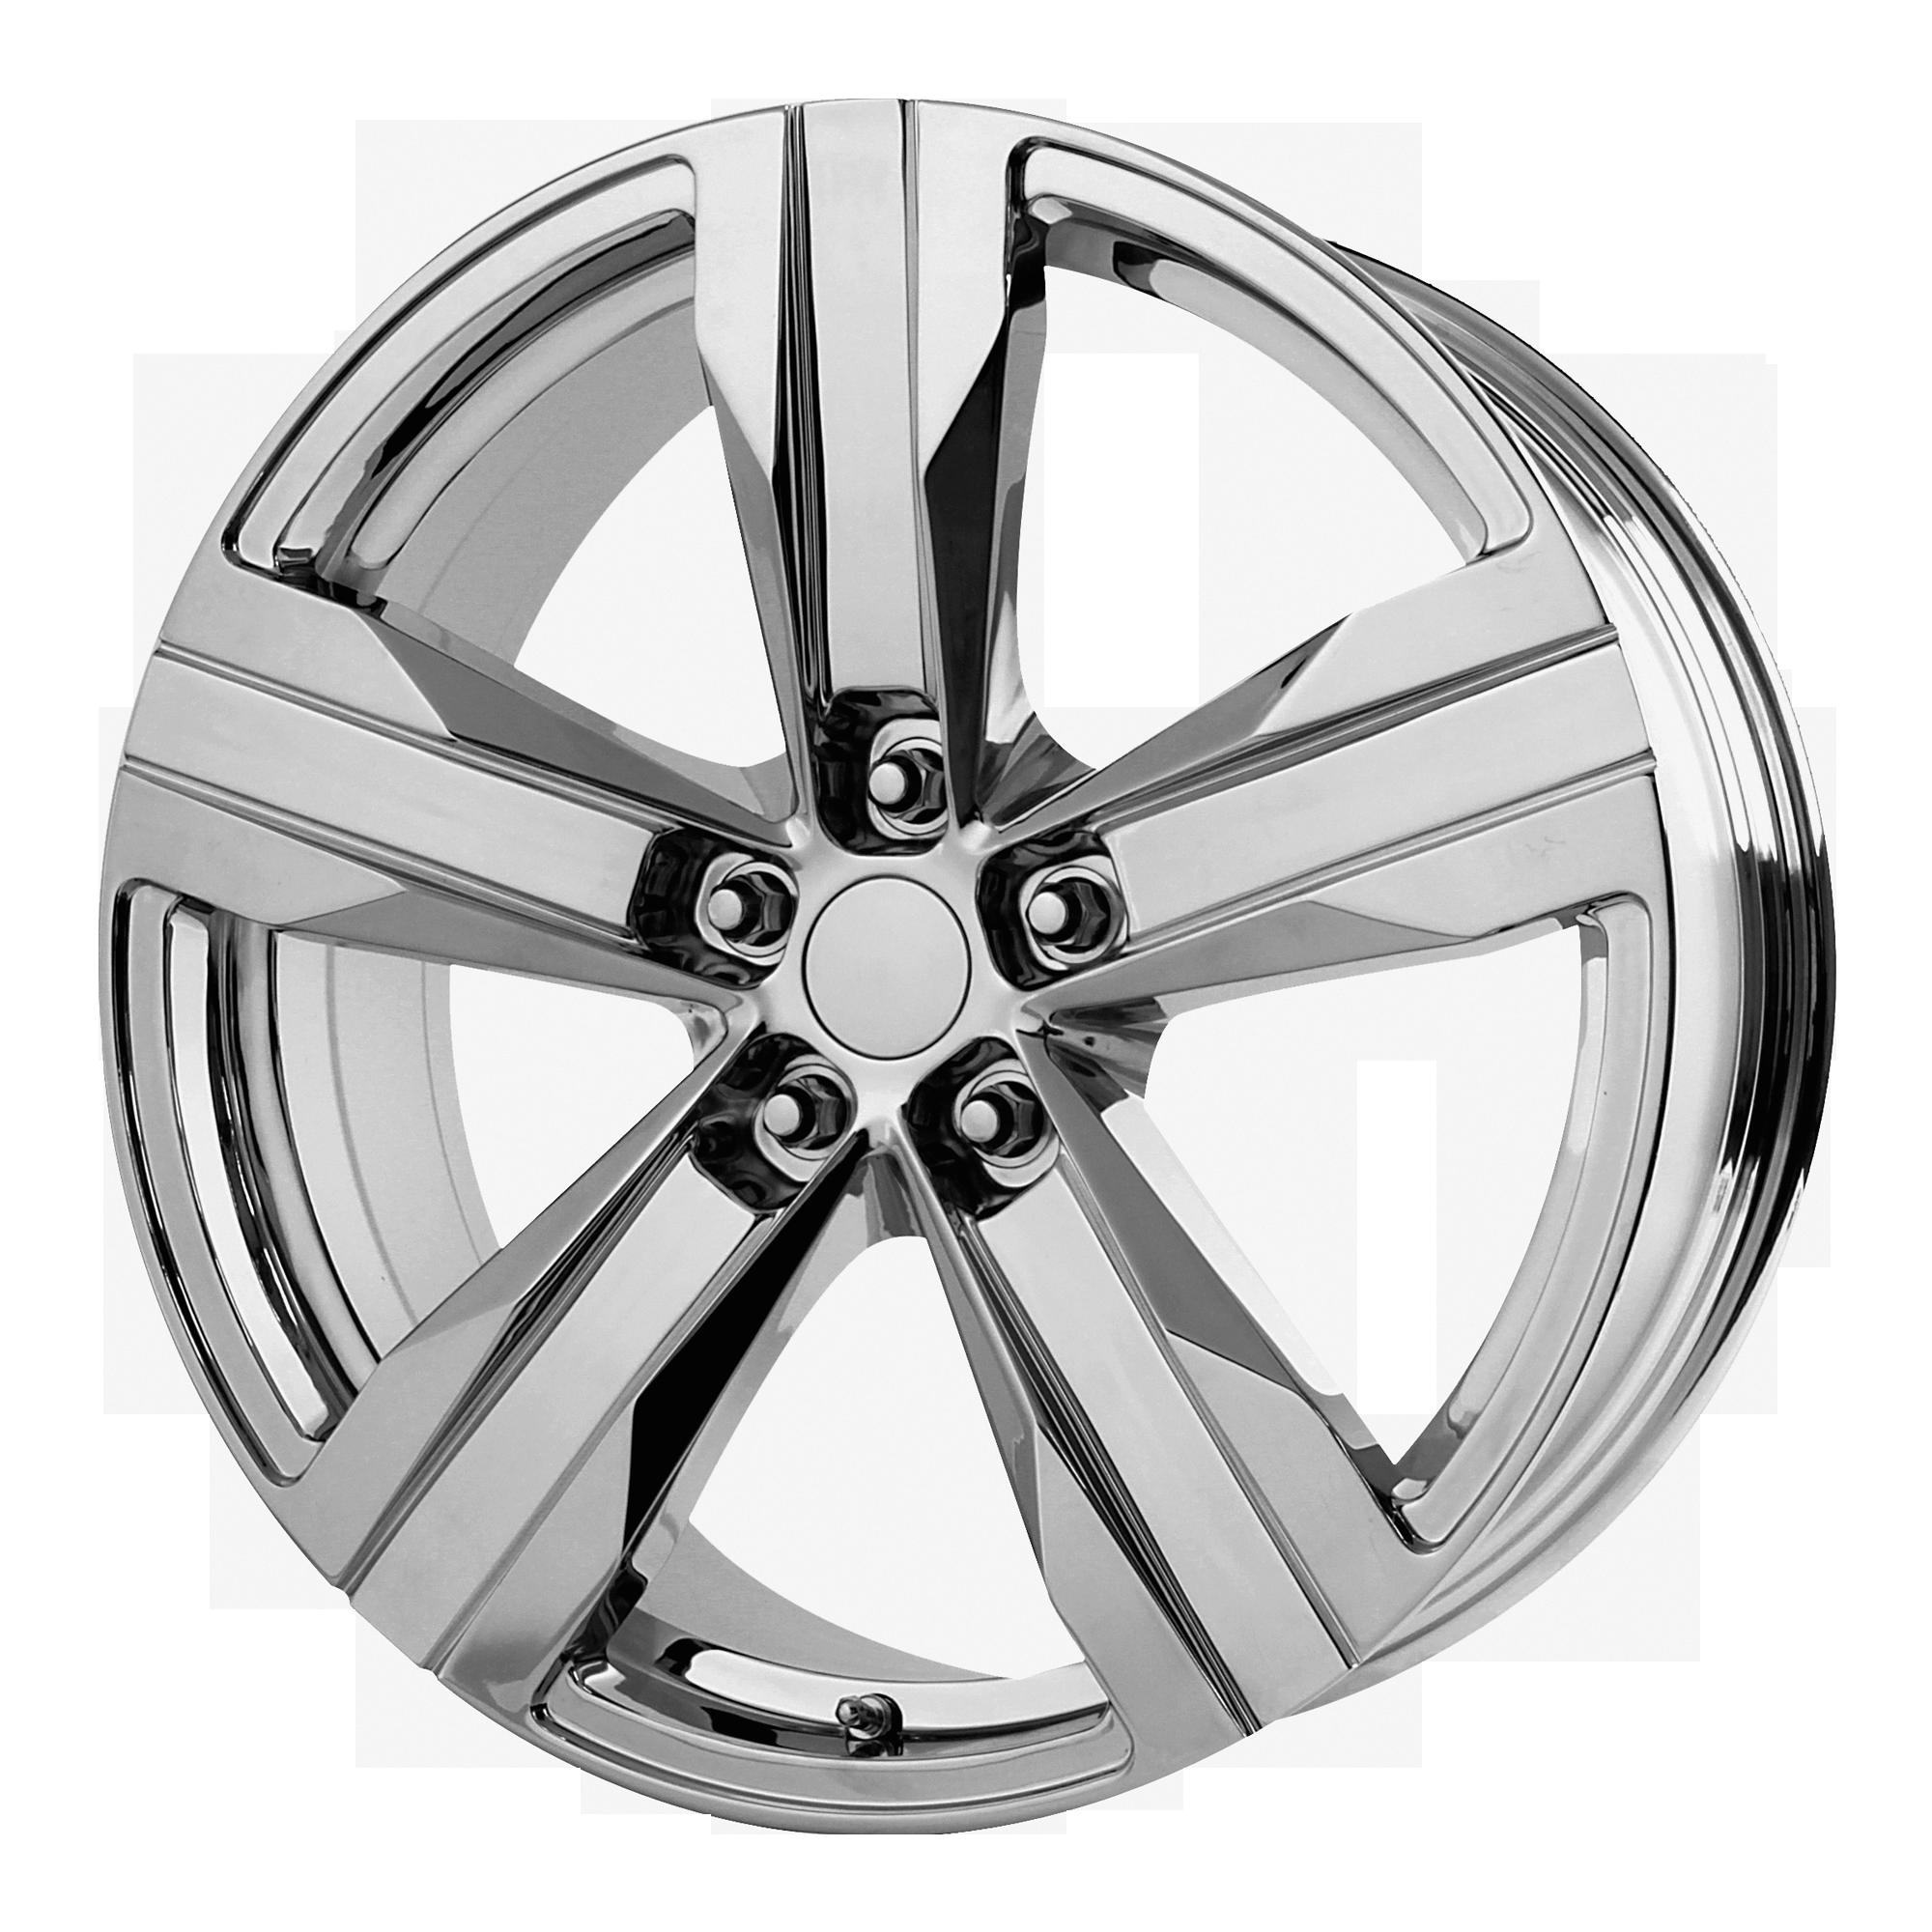 OE Creations Replica Wheels OE Creations PR135 Chrome